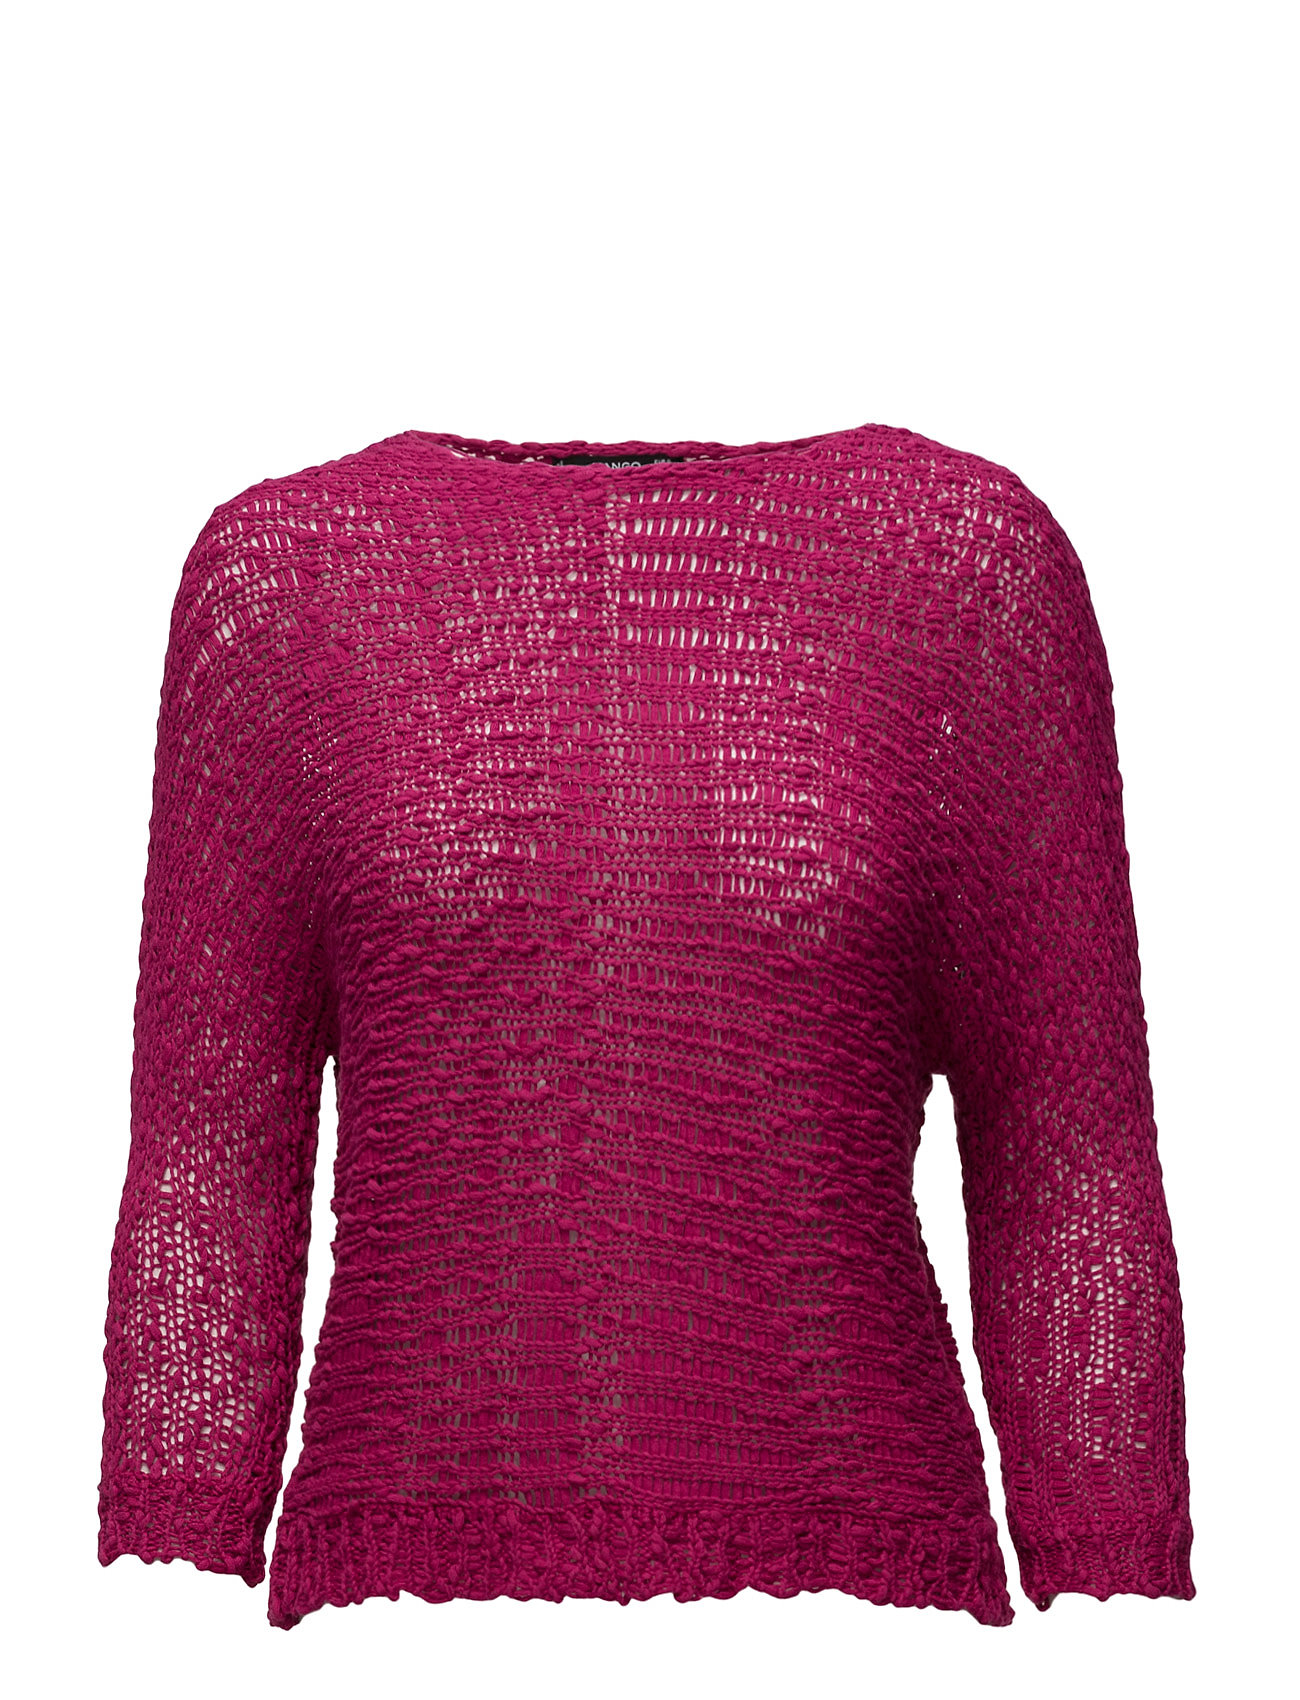 Openwork Knit Sweater Mango Sweatshirts til Damer i Bright Pink